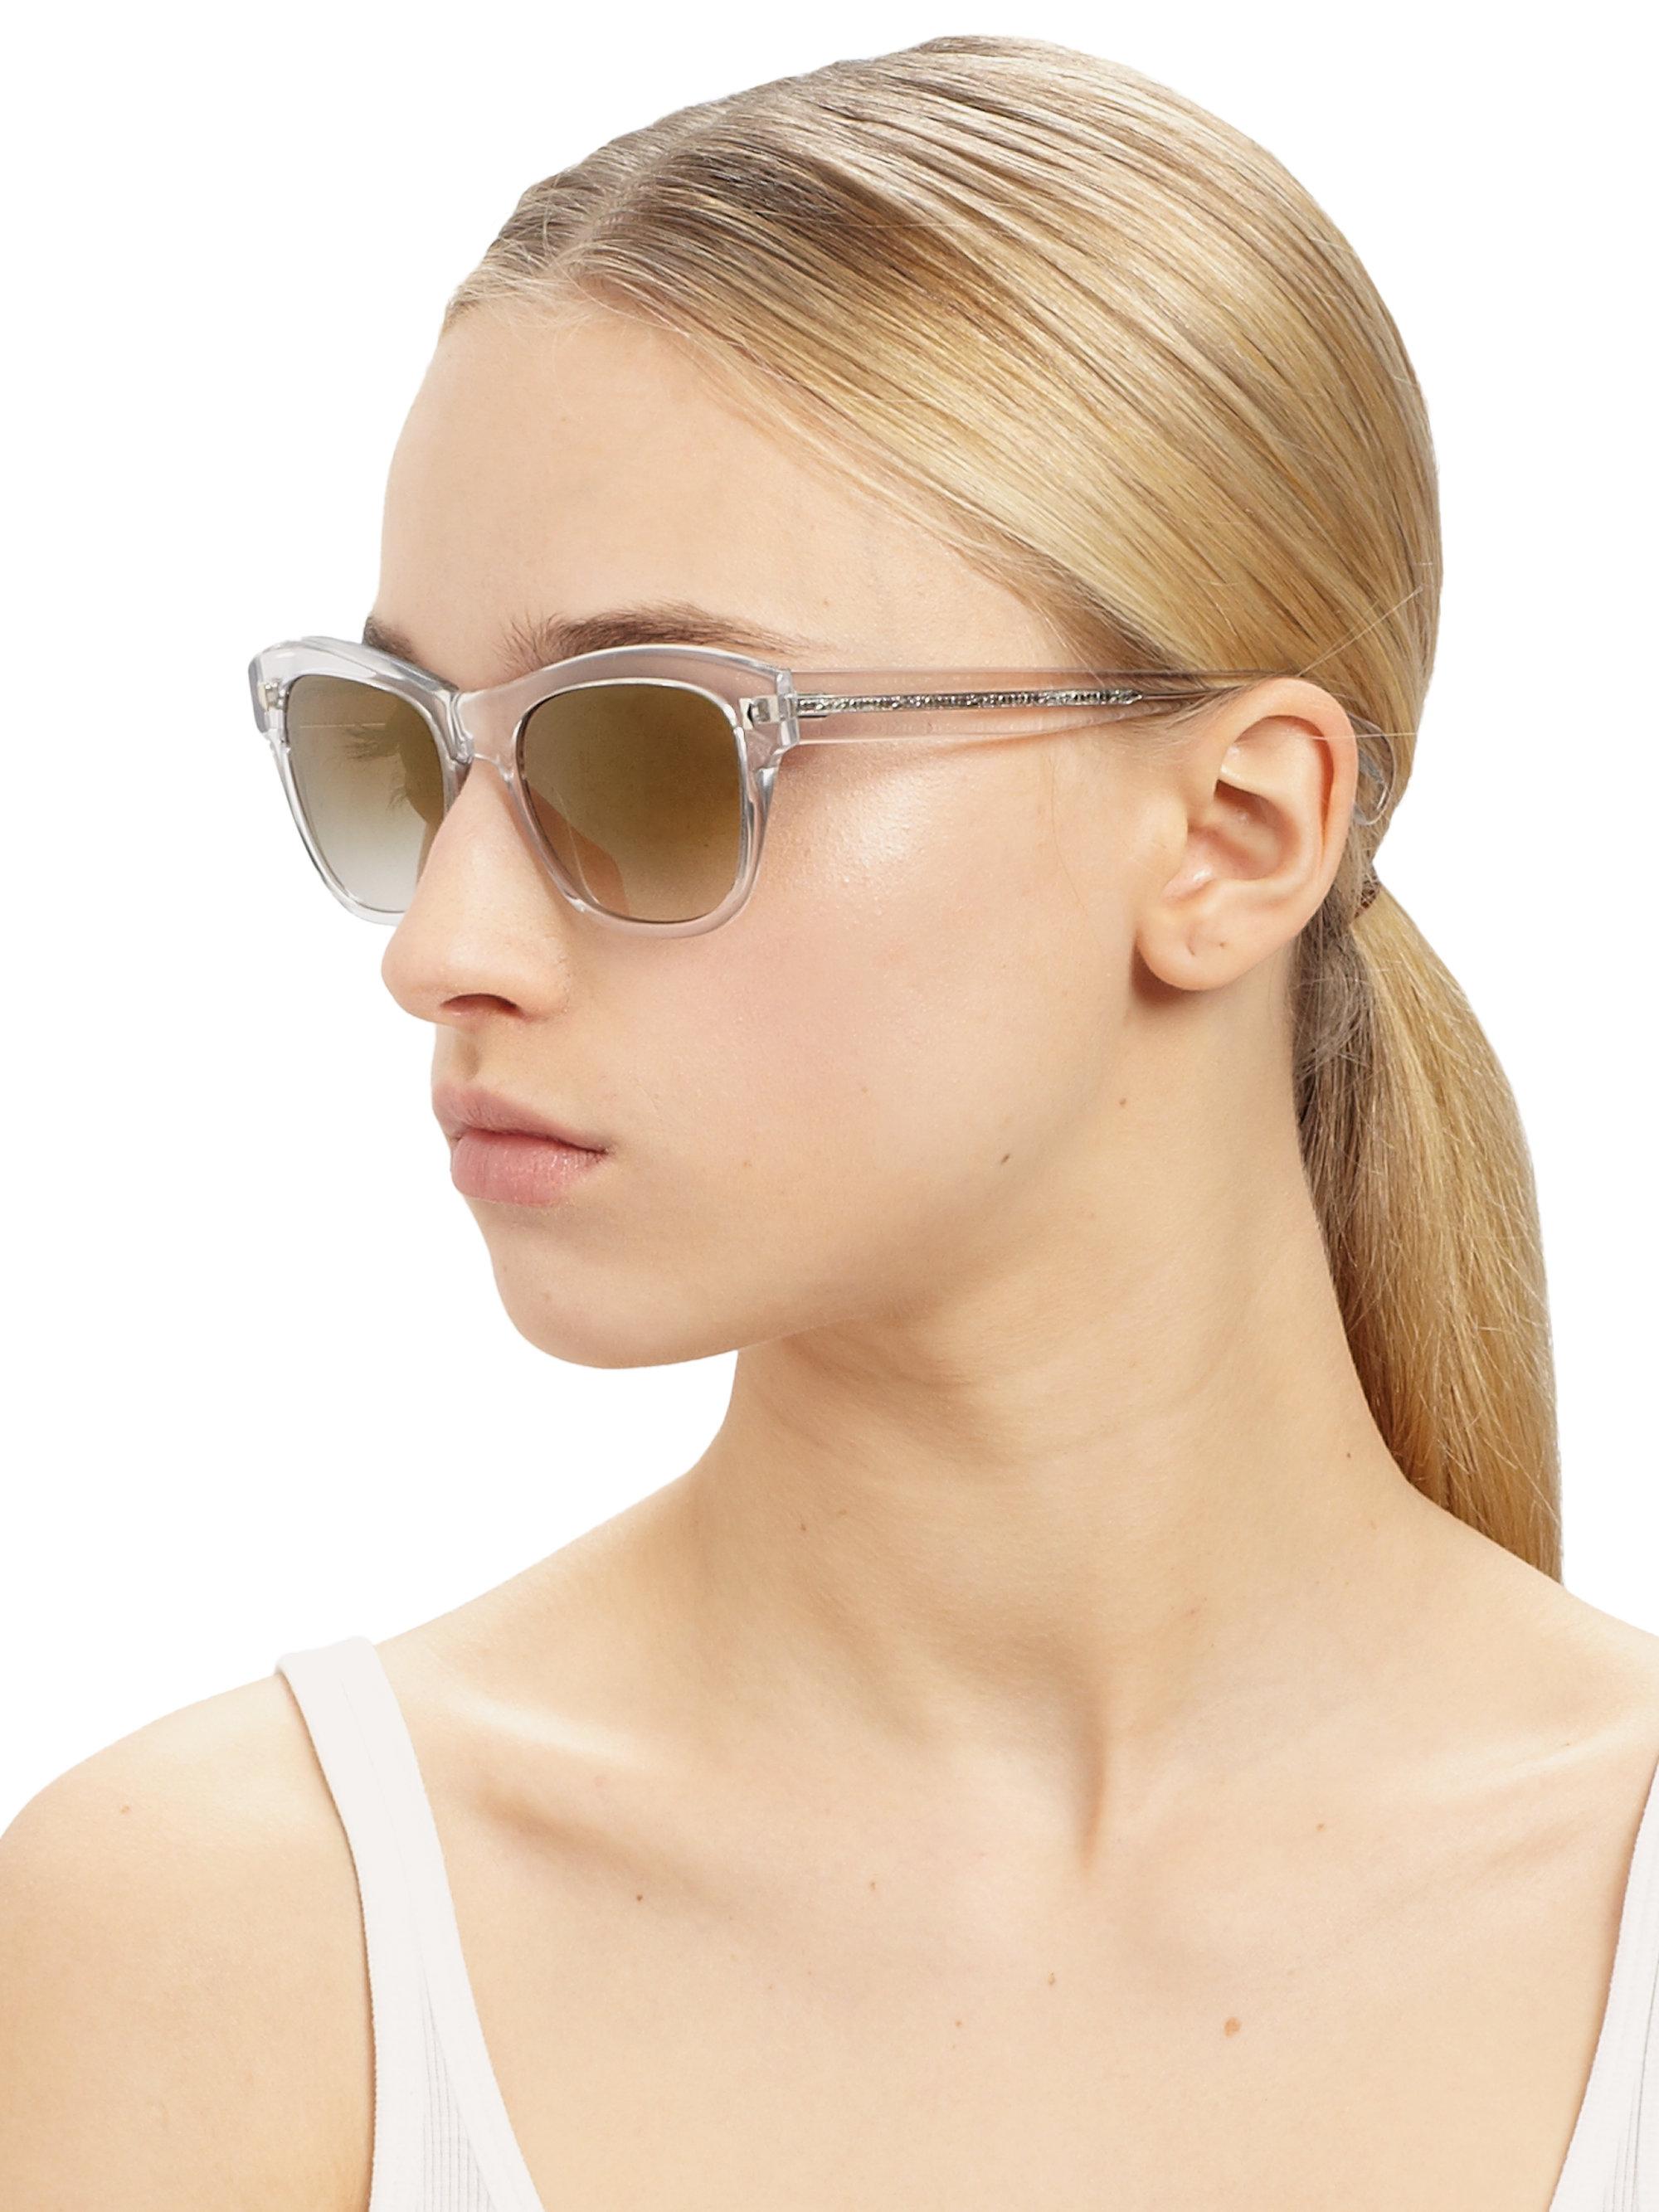 Oliver Square Peoples Sunglasses 53mm Sofee Multicolor Polarized Pn0O8wk